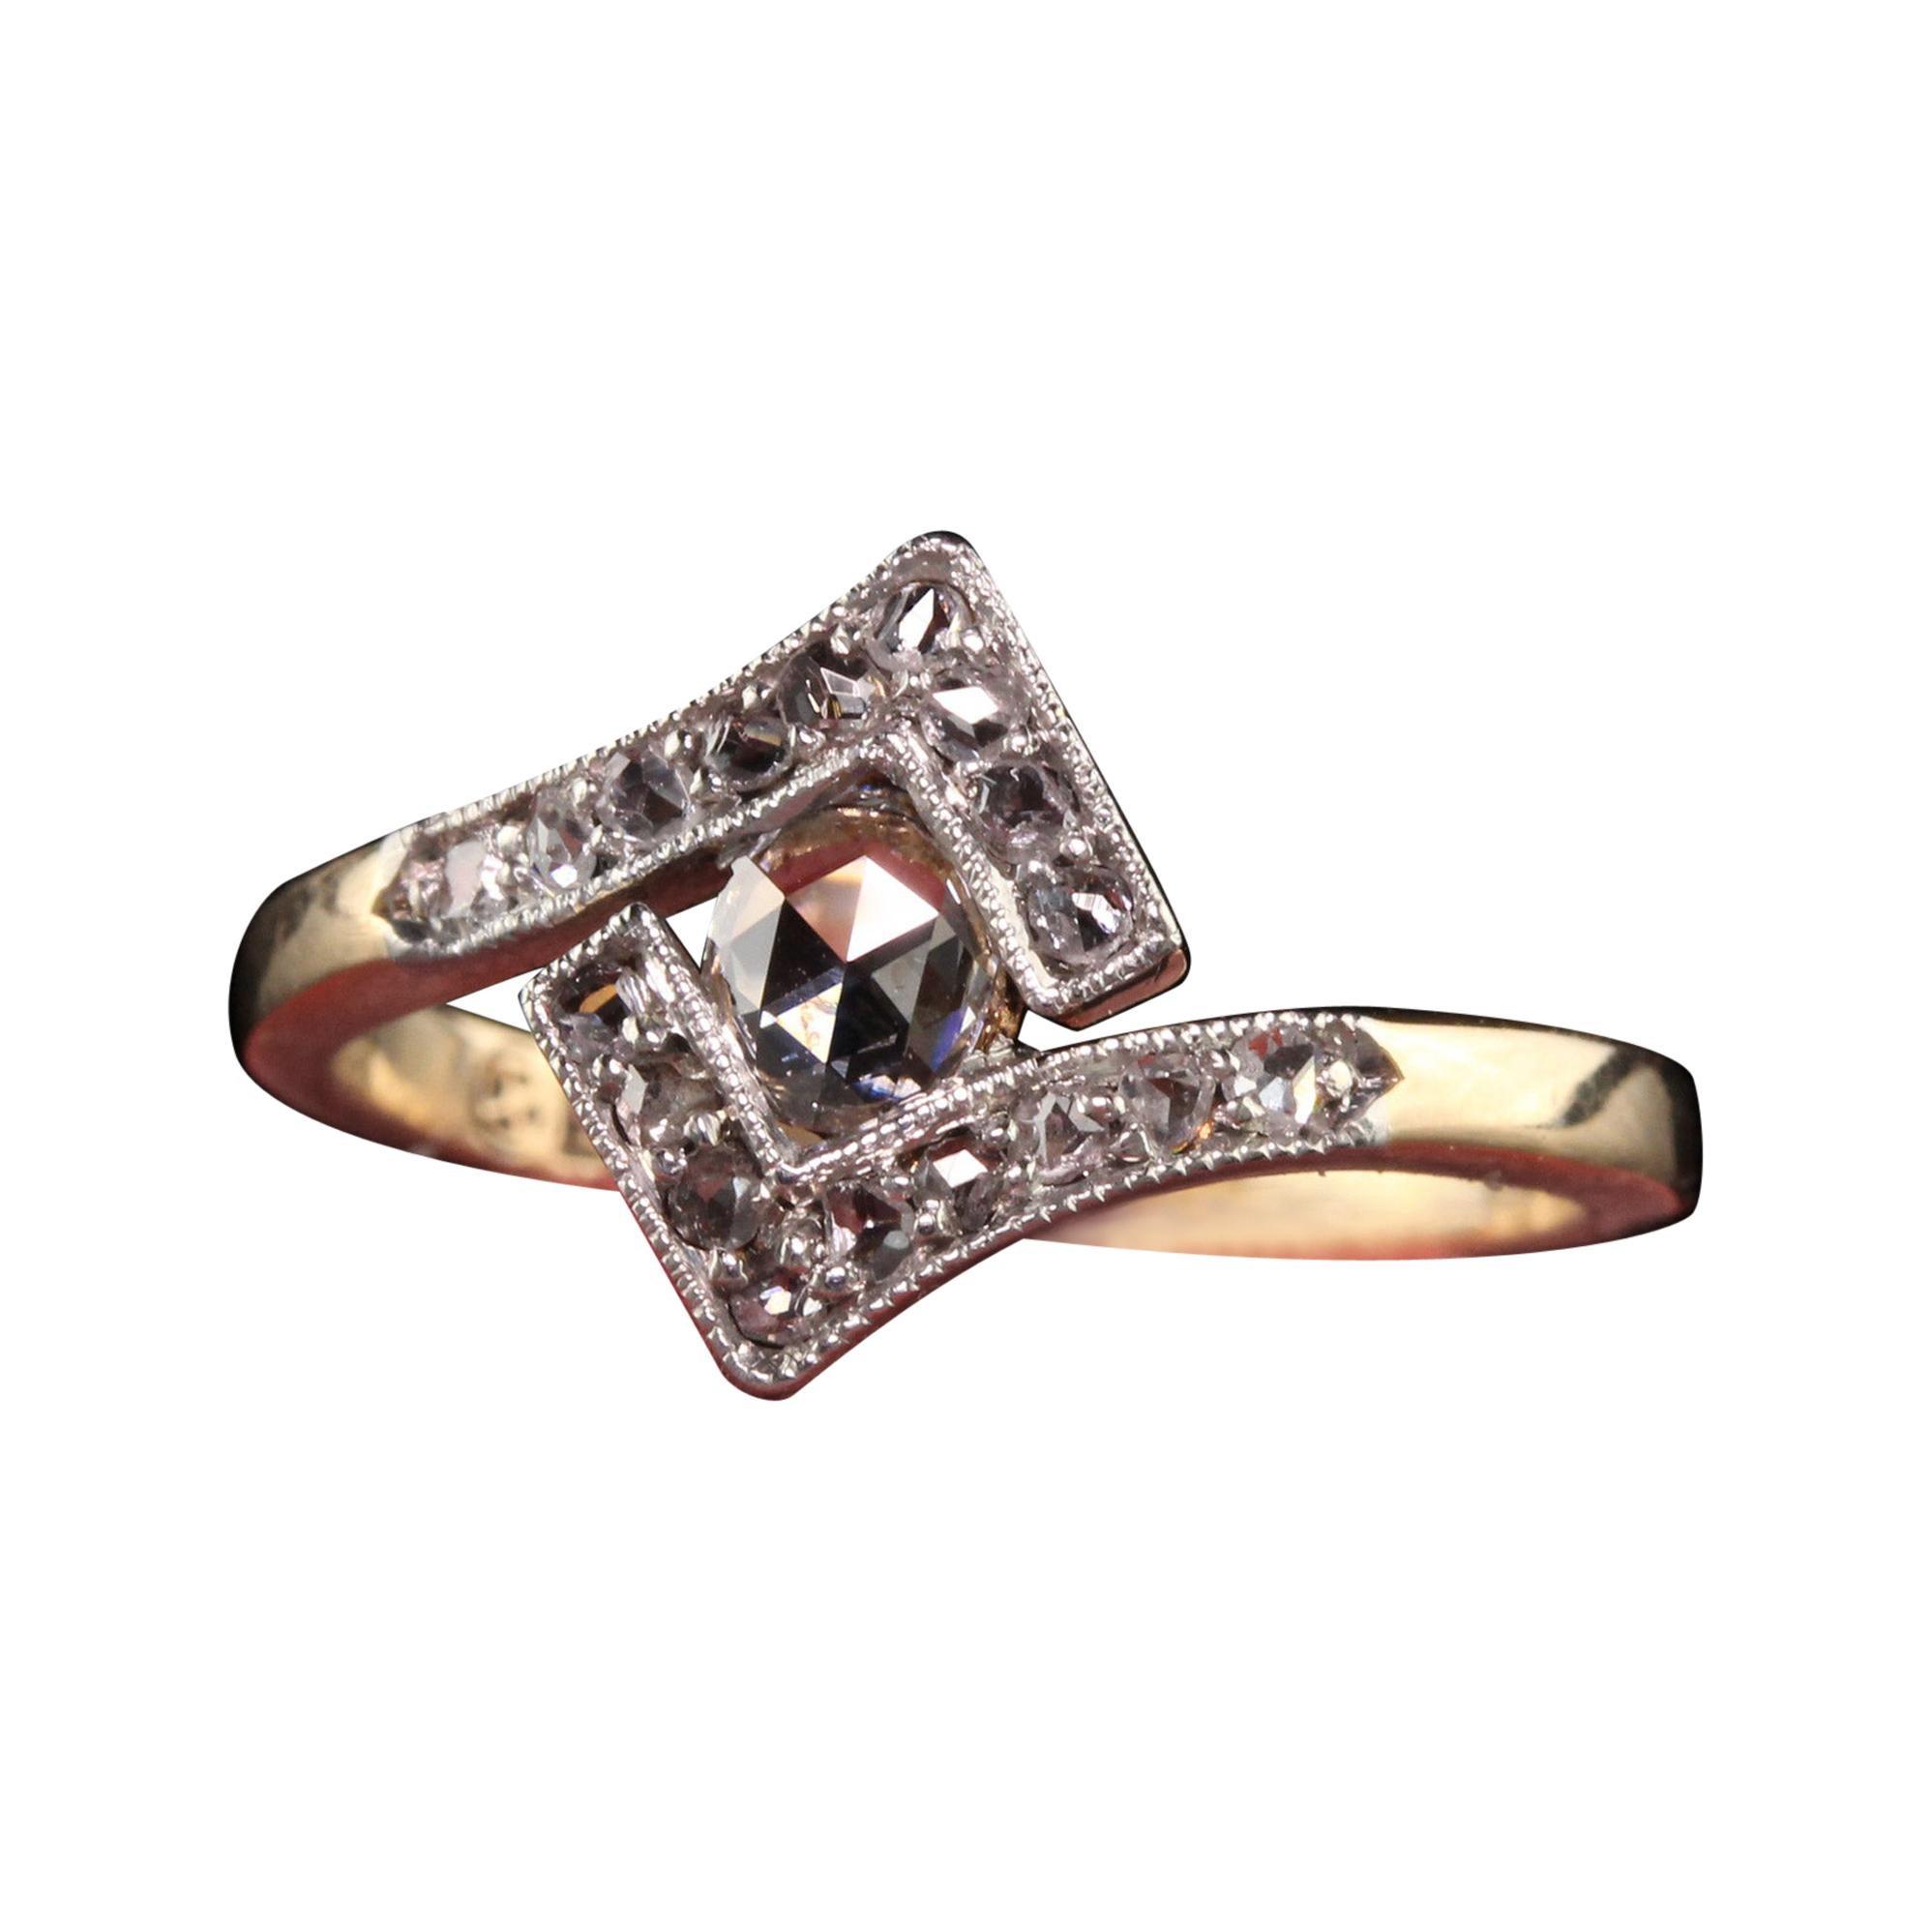 Antique Victorian 18K Yellow Gold Platinum Top Rose Cut Diamond Ring